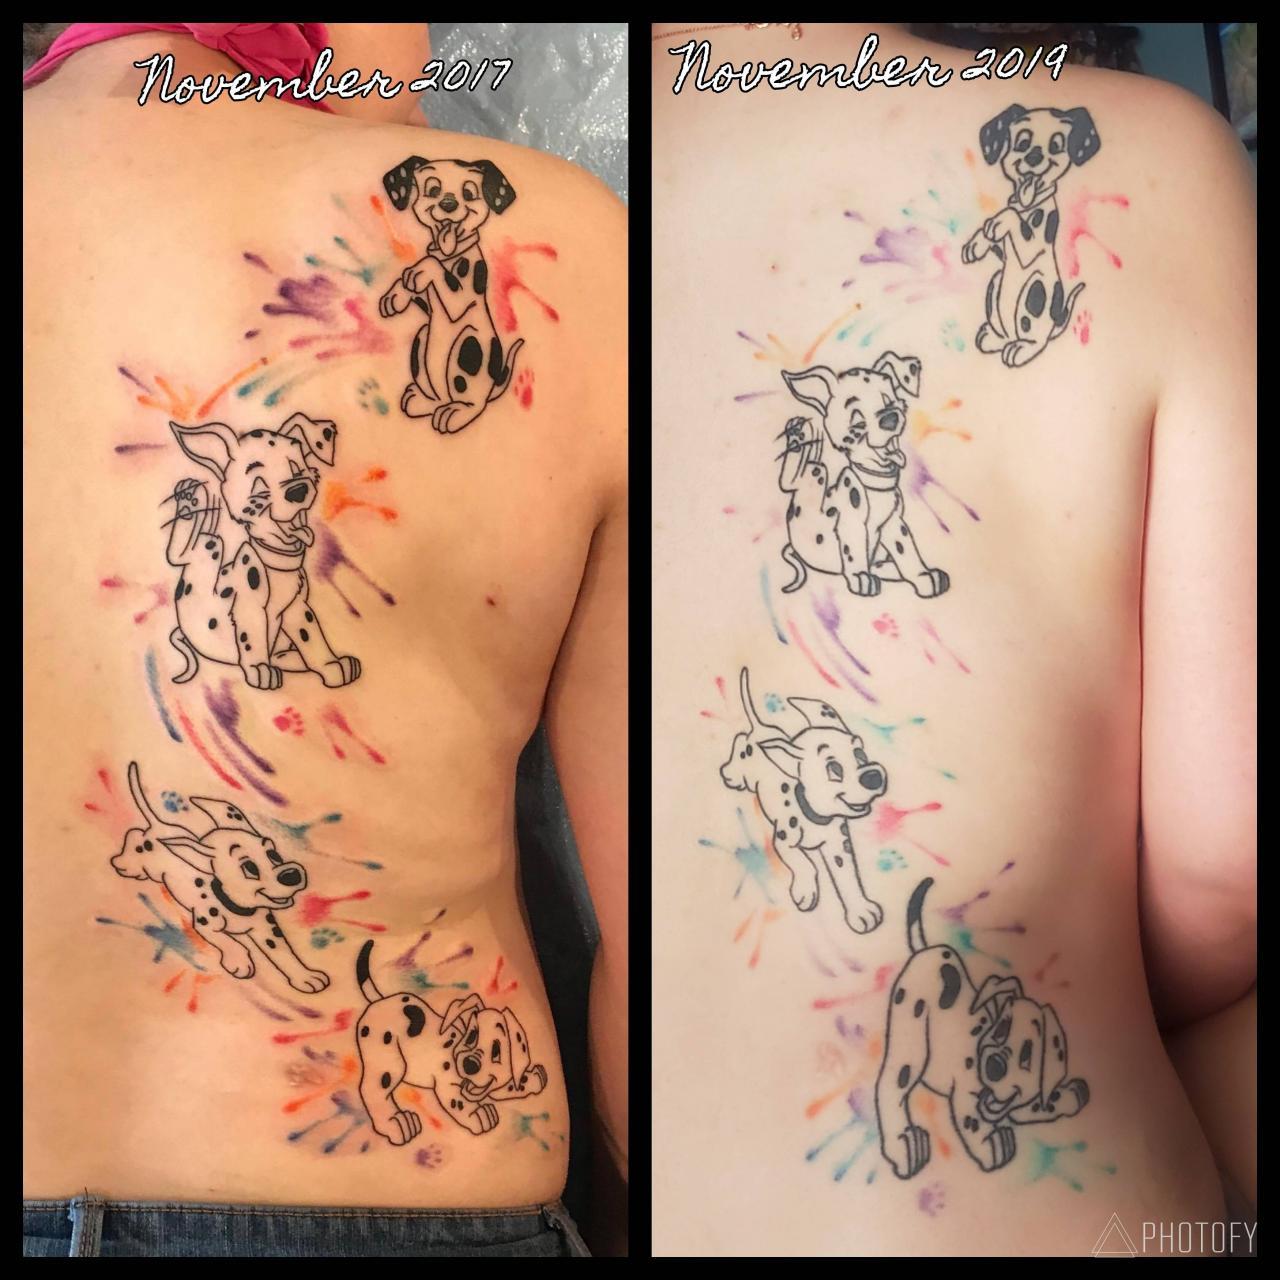 2yr Healed Comparison- done by Al Lyttle of Stutter Tattoo in Lake Havasu City, AZ